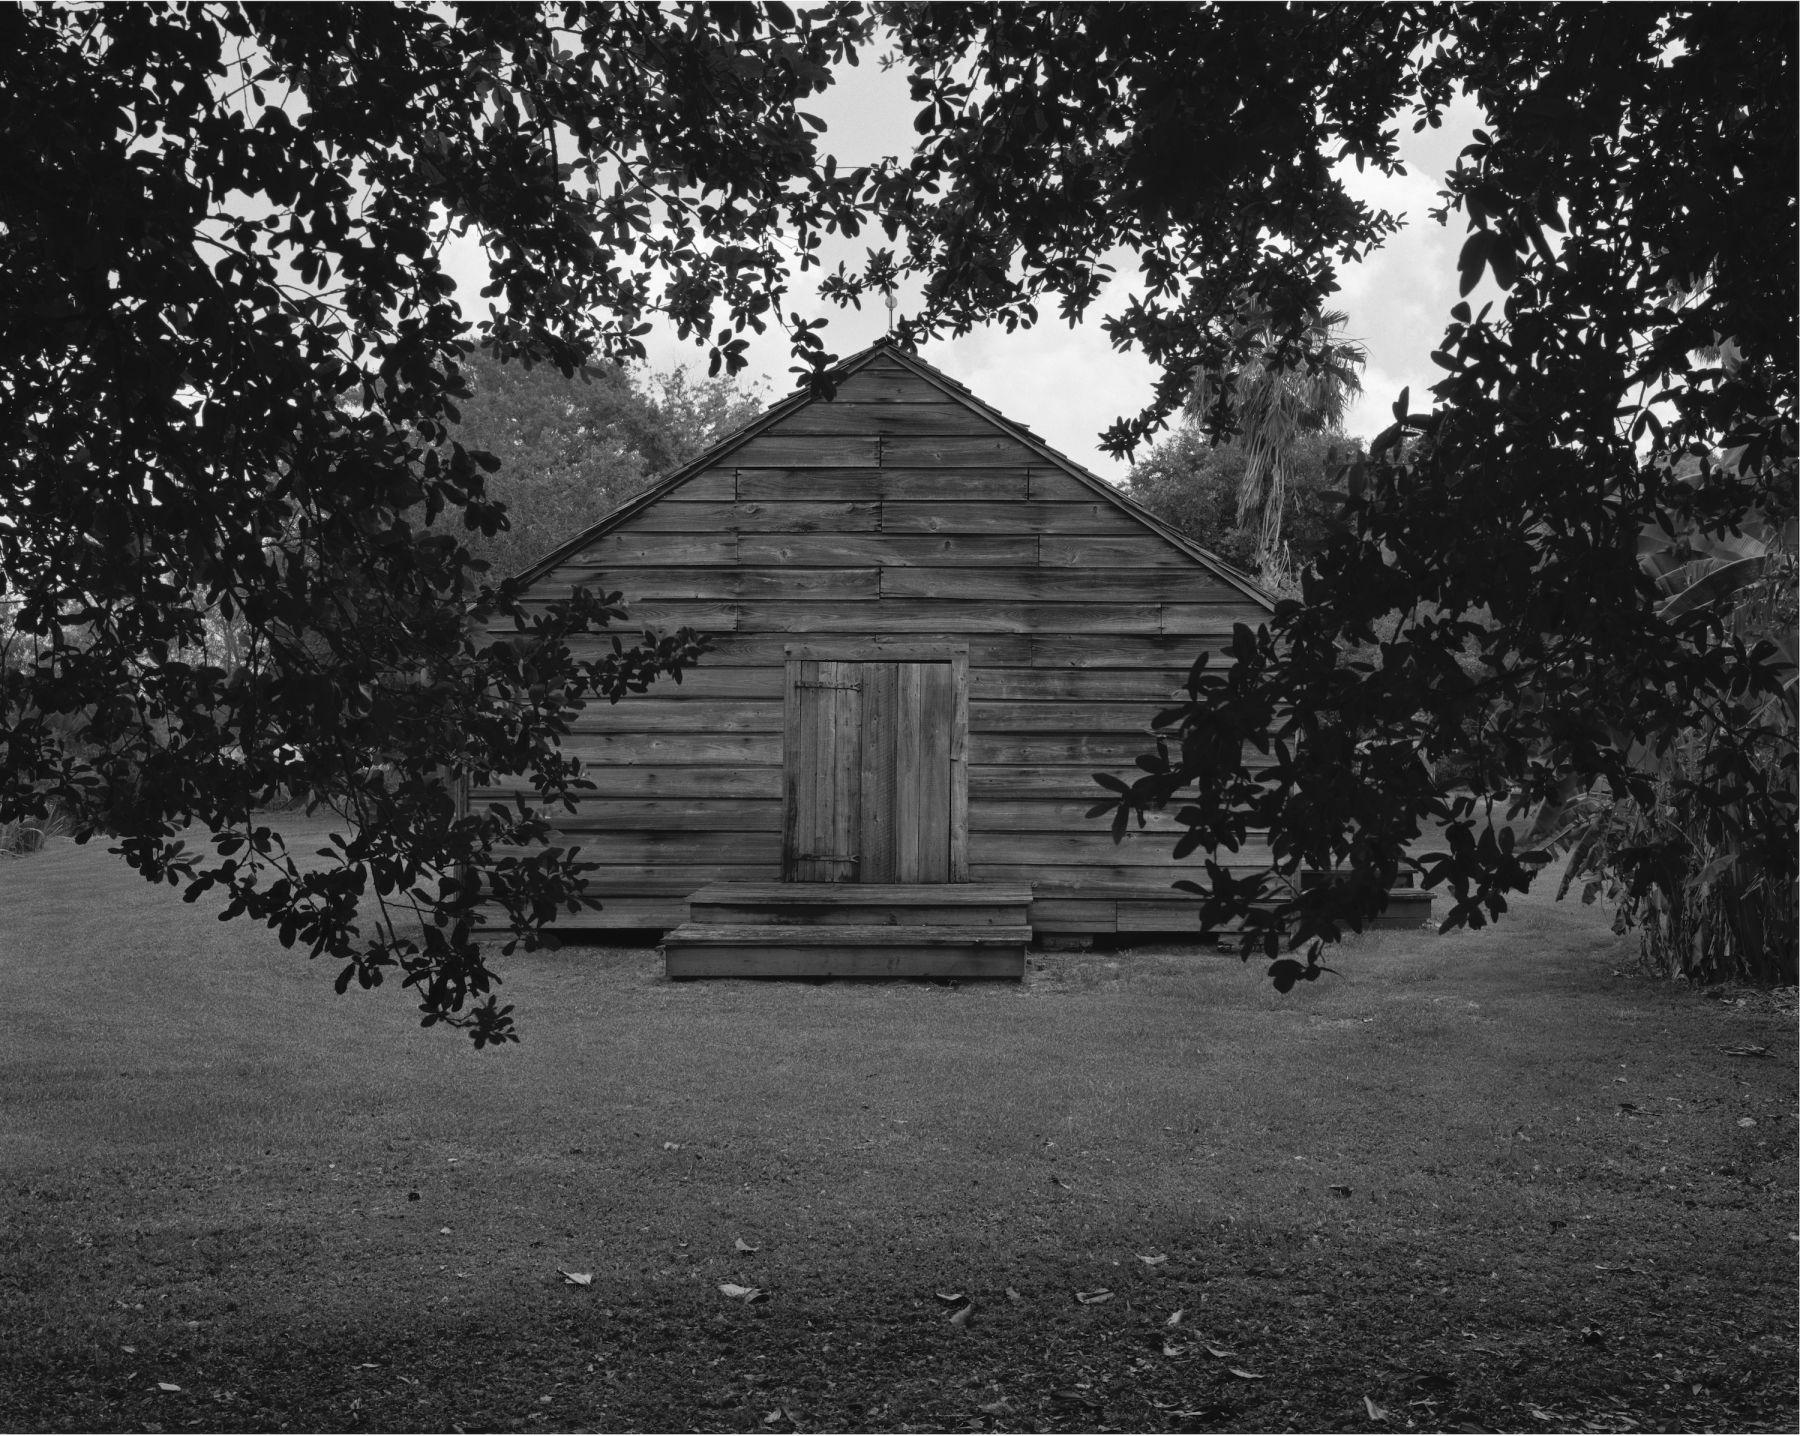 large image - cabin